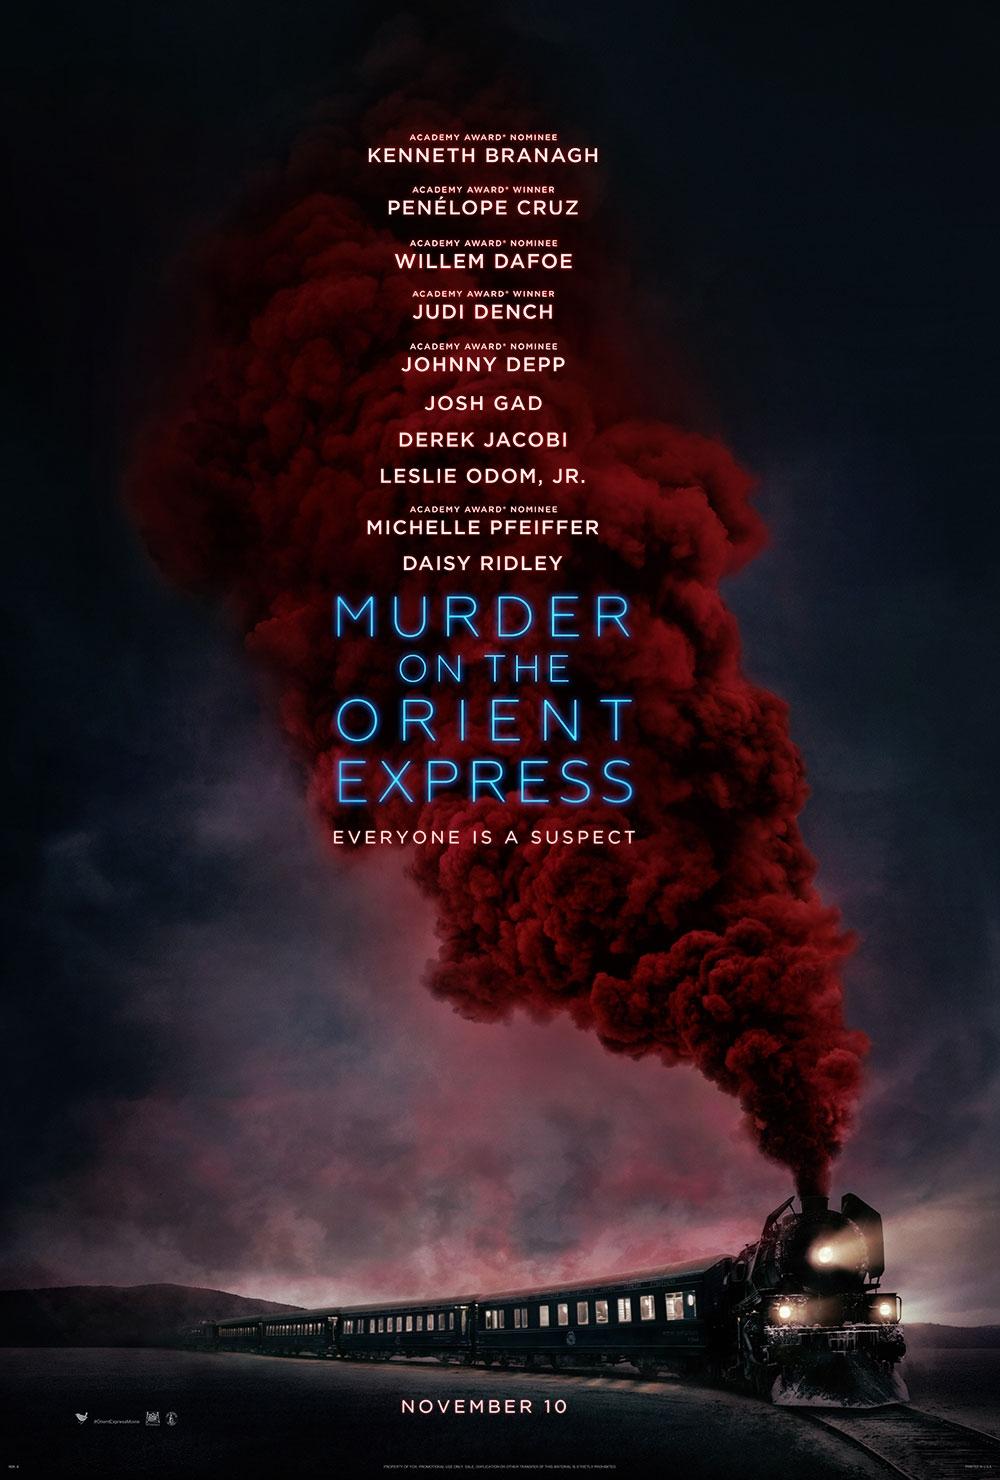 https://www.foxmovies.com/movies/murder-on-the-orient-express